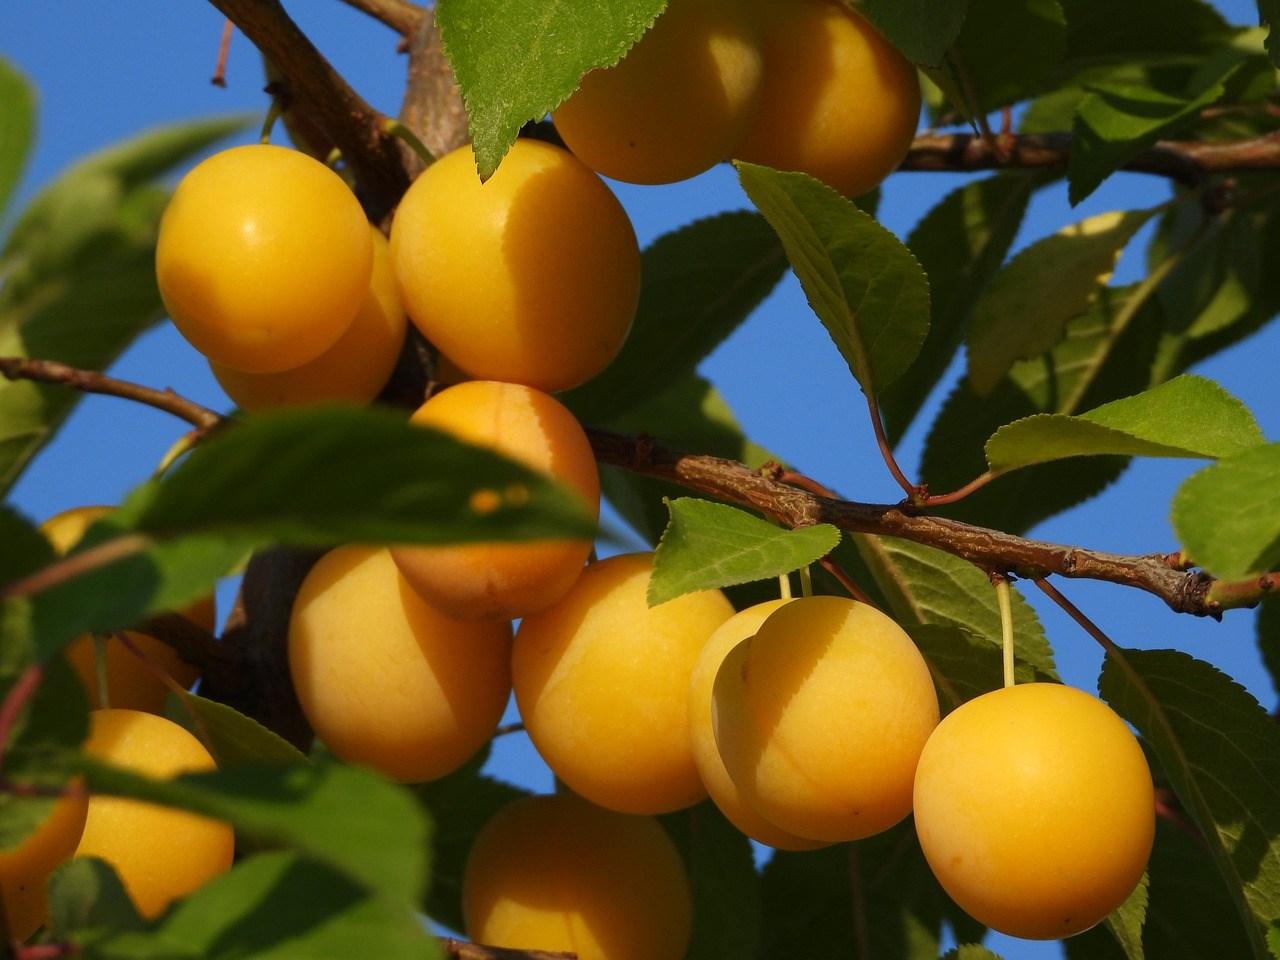 fruit-tree-4387738_1280.jpg